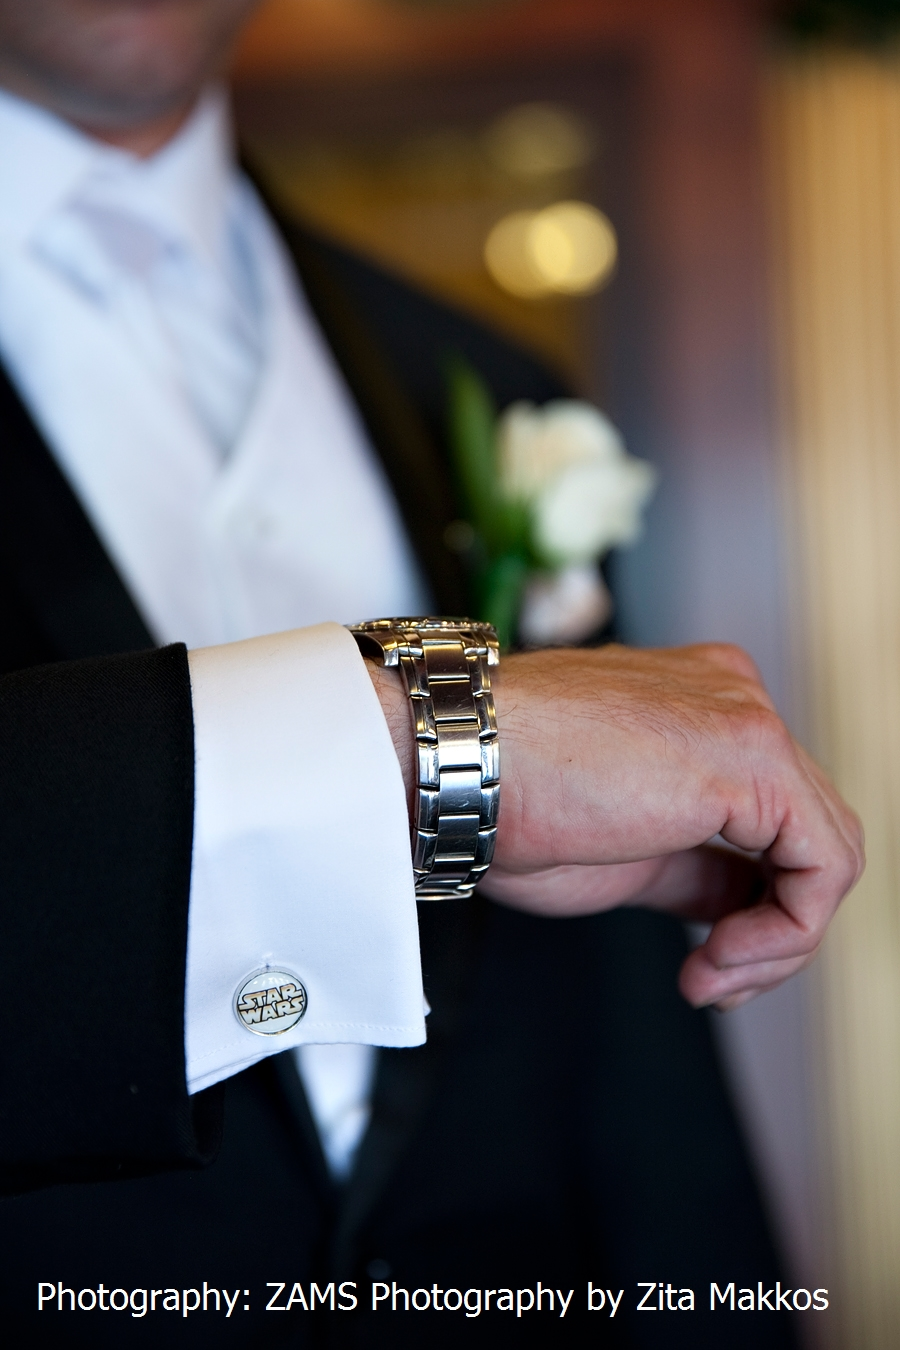 manson_vs_manson_cuff_links_men_wedding_groomsmen_gift_cufflinks_2.jpg